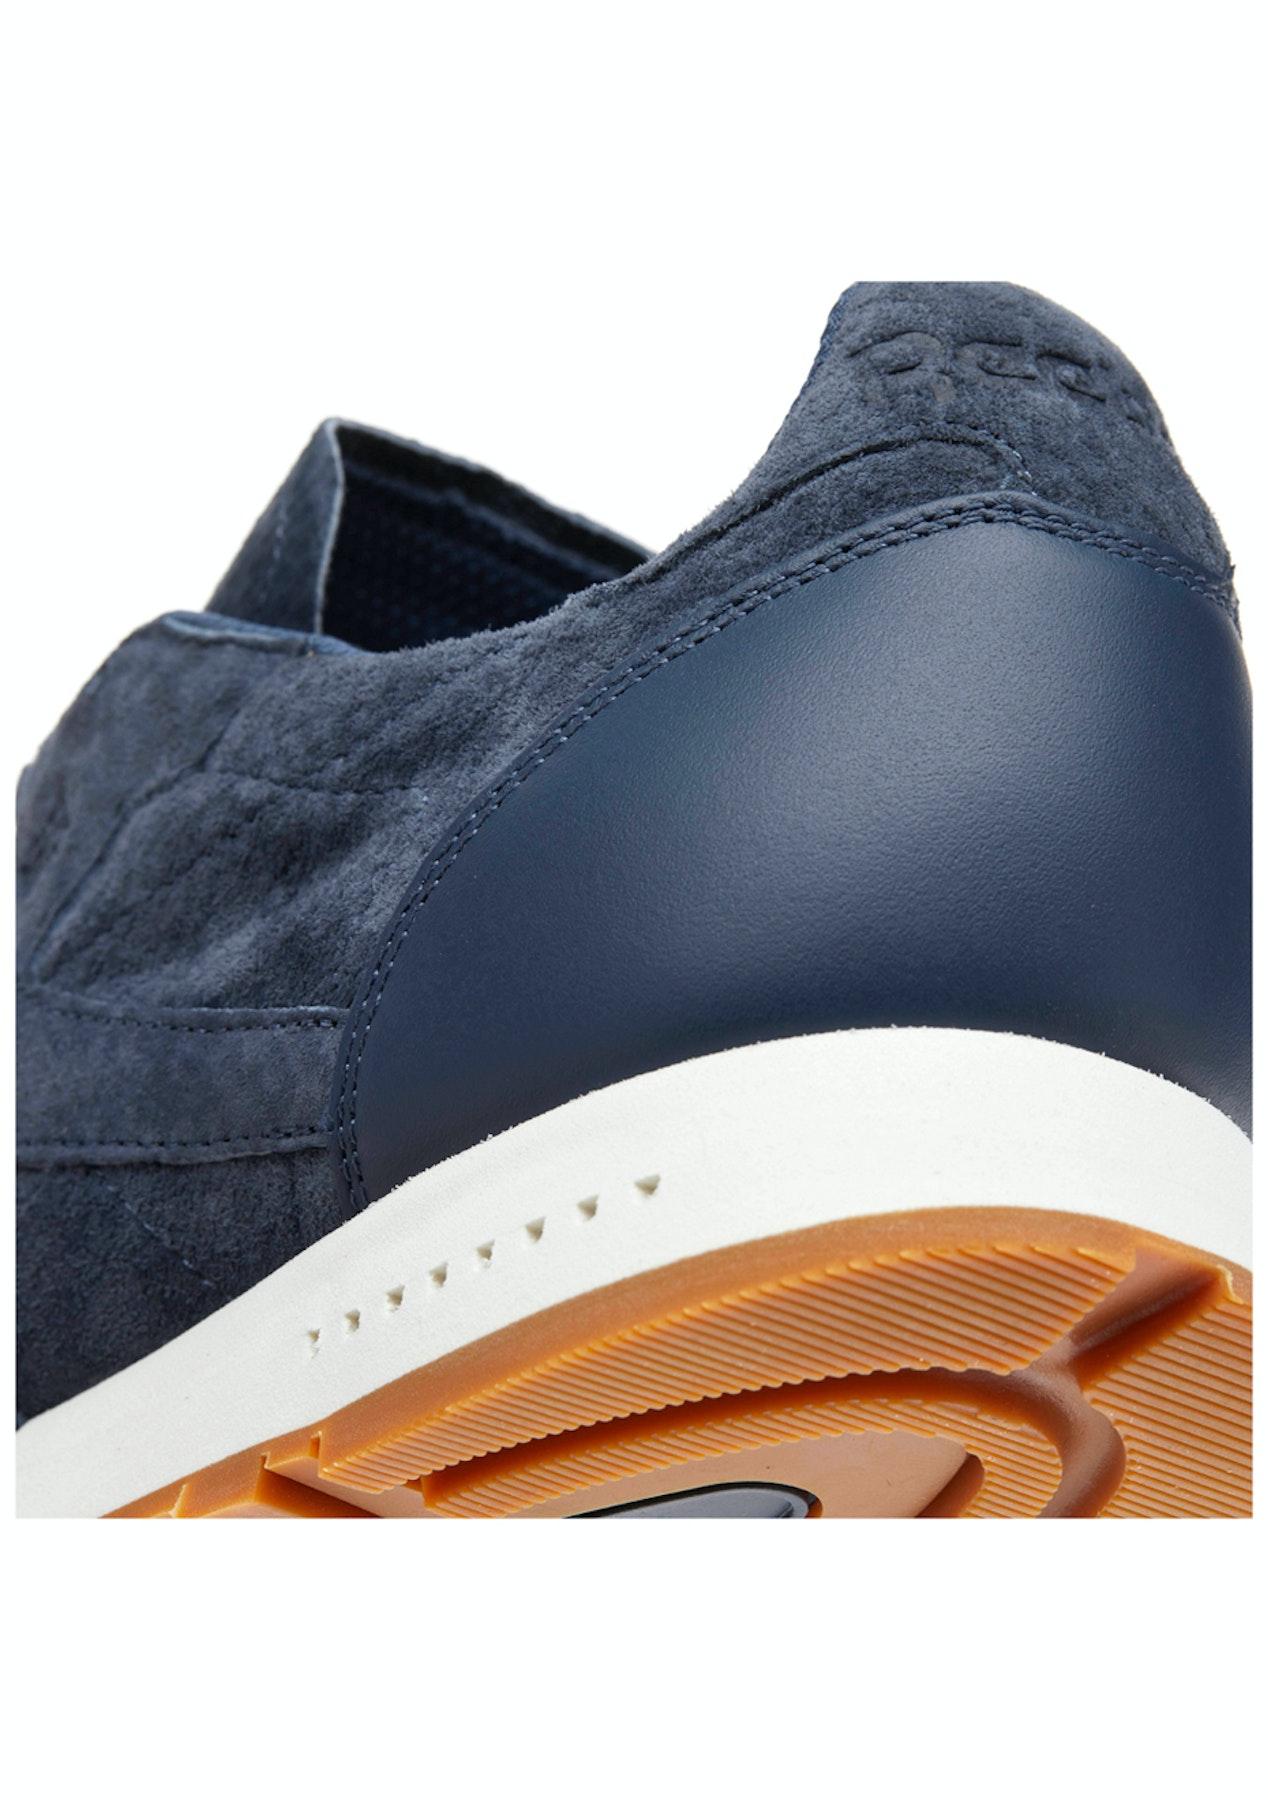 02a99d0c37447 Reebok Mens - Classic Leather Sg Smoky Indigo Chalk-G - Free Shipping Shoe  Sale - Onceit